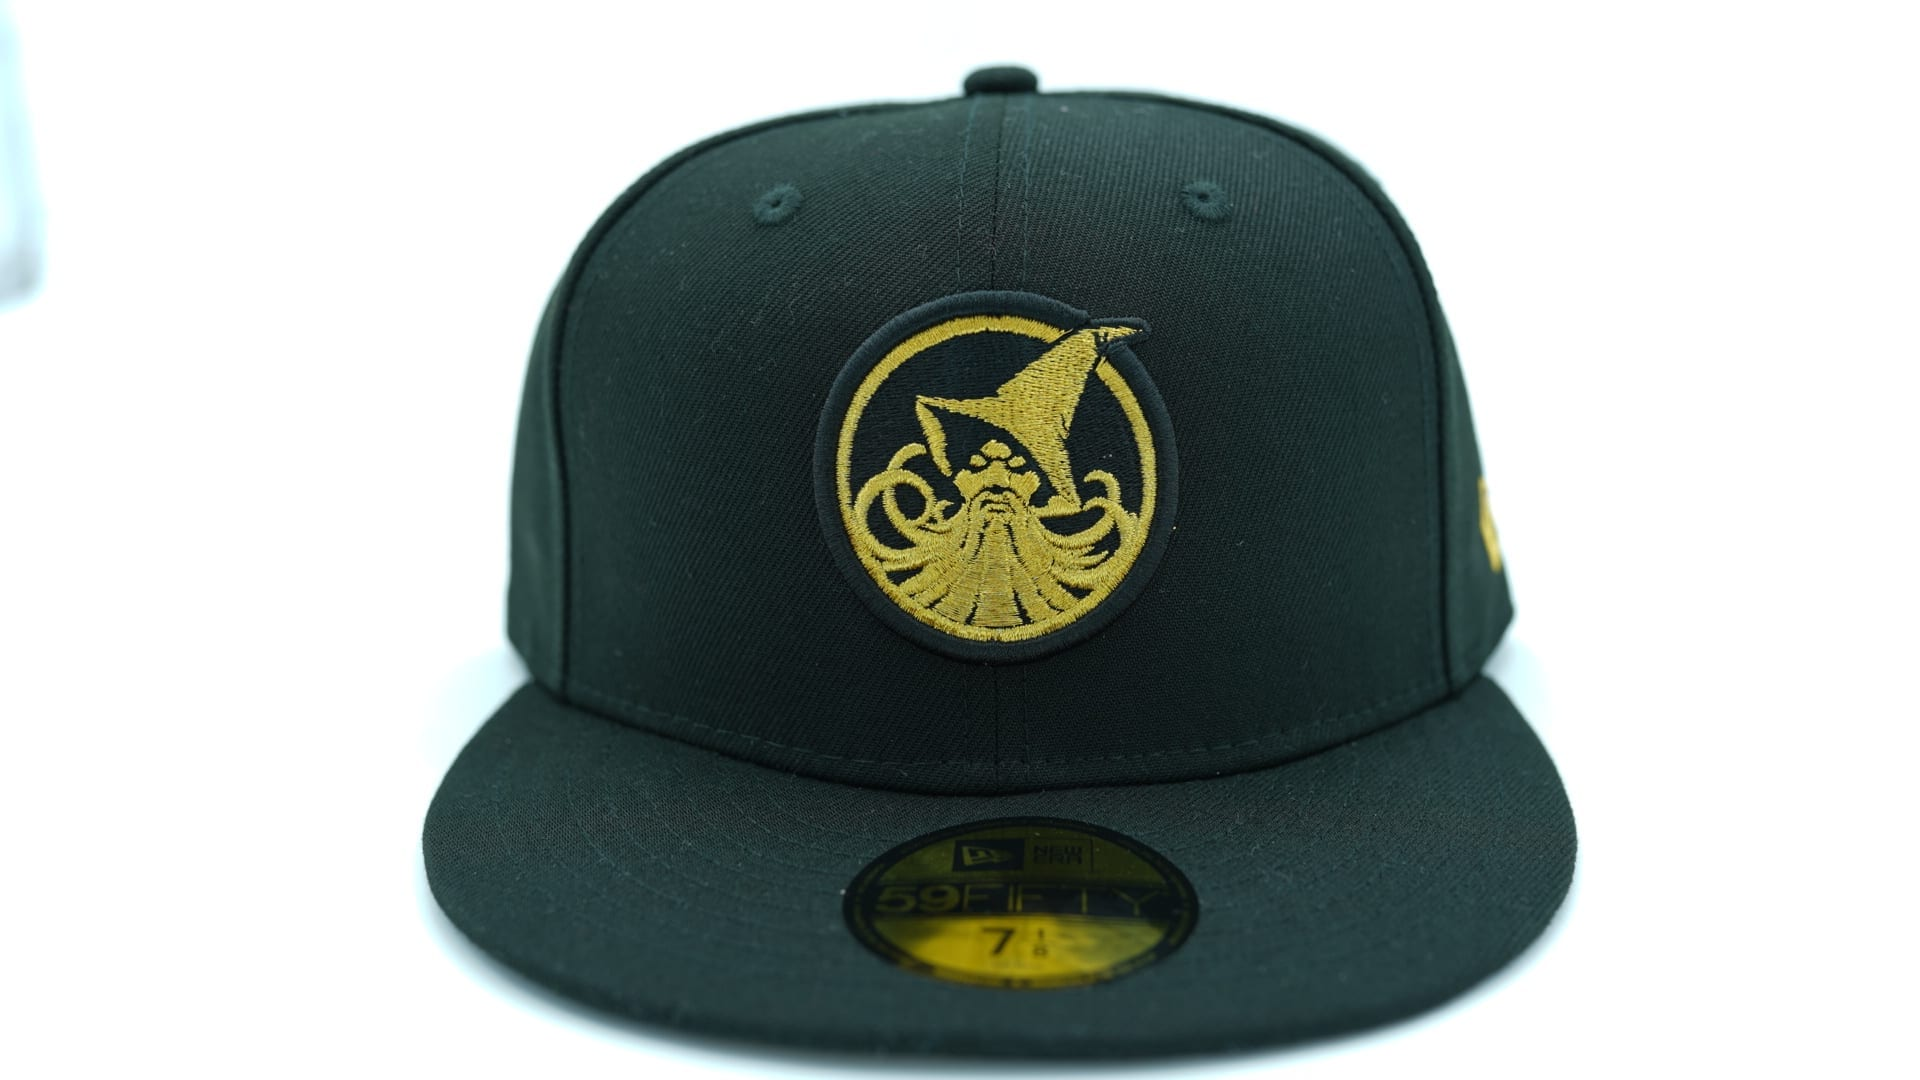 53771acb069 New 2016 Arizona Diamondbacks Alternate On-Field Caps   HAT CLUB ...